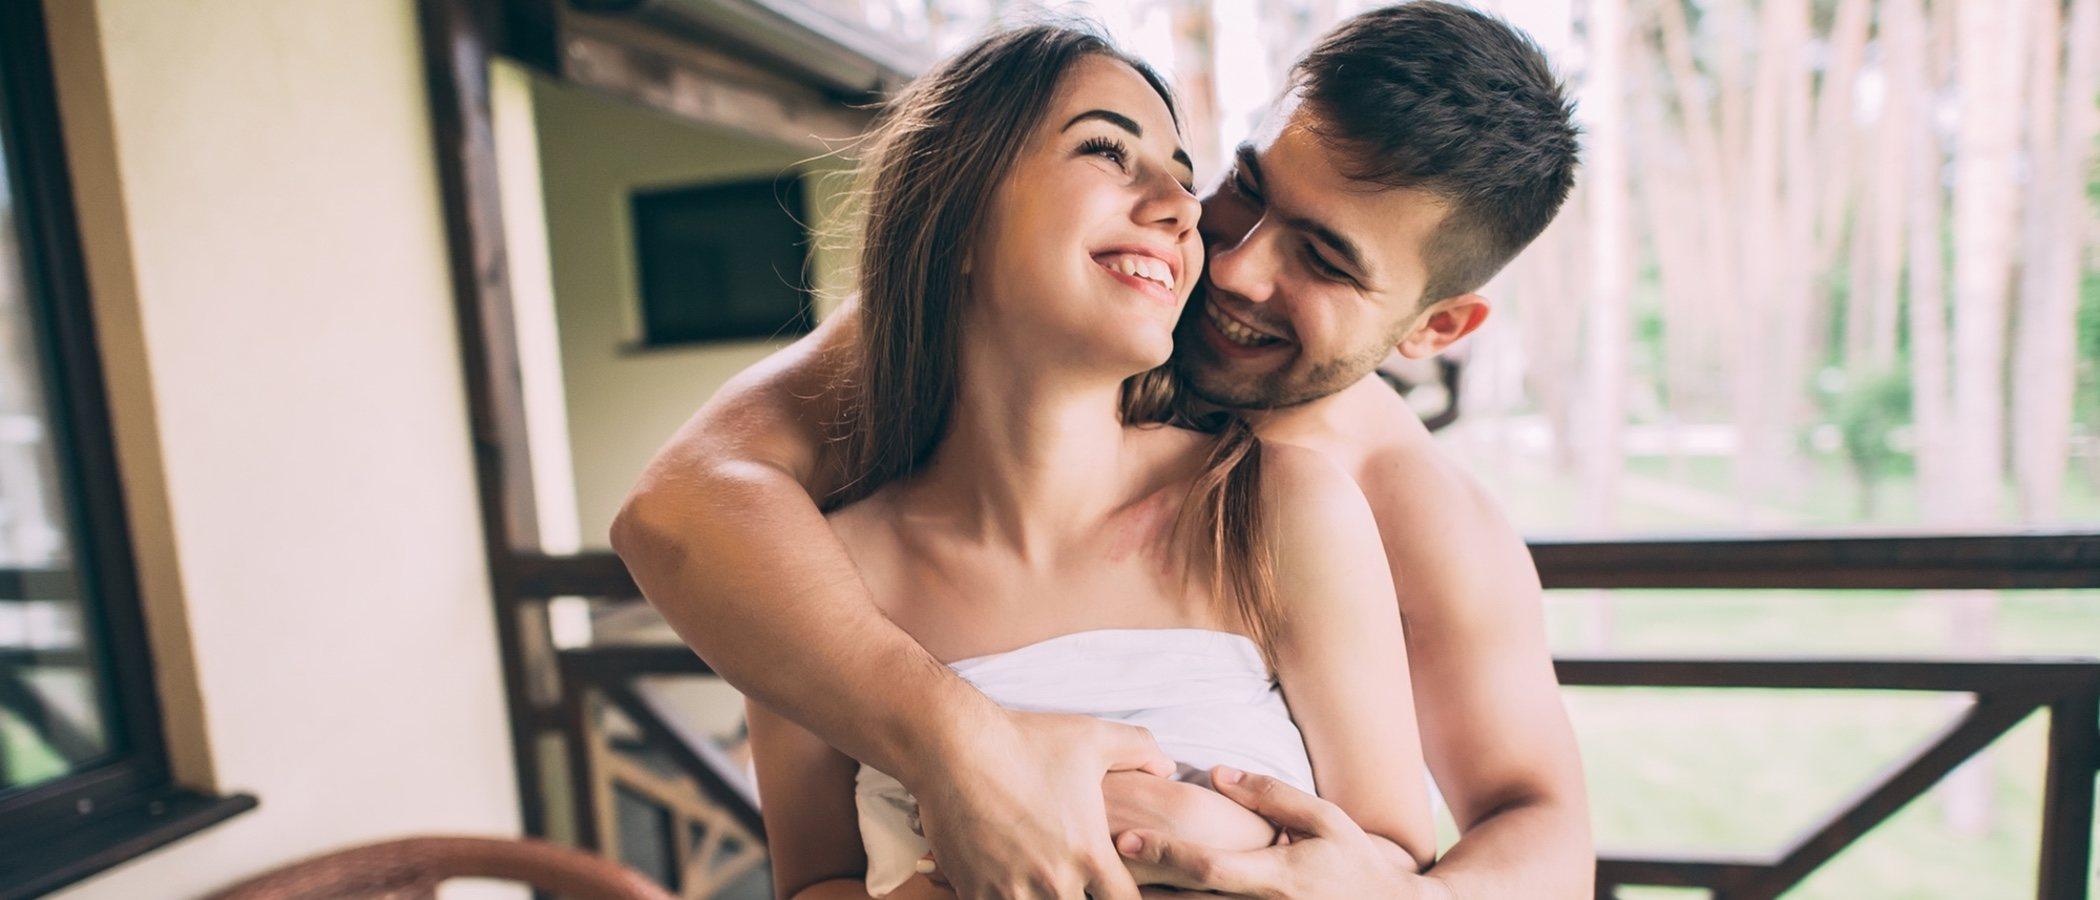 Horóscopo sexual enero 2019: Tauro